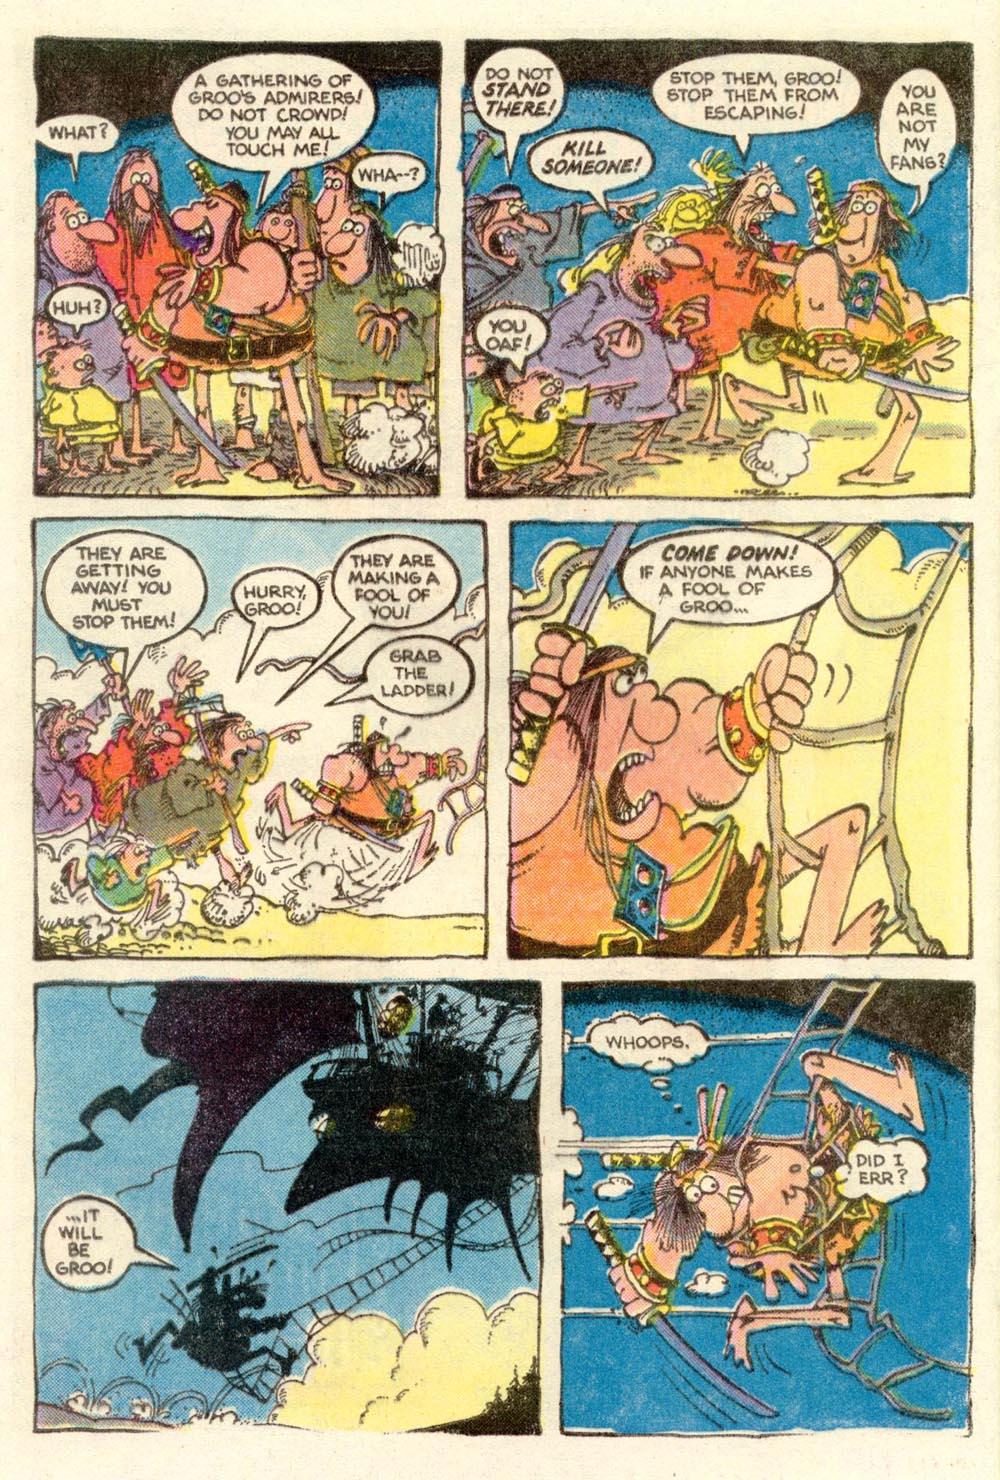 Read online Sergio Aragonés Groo the Wanderer comic -  Issue #4 - 5